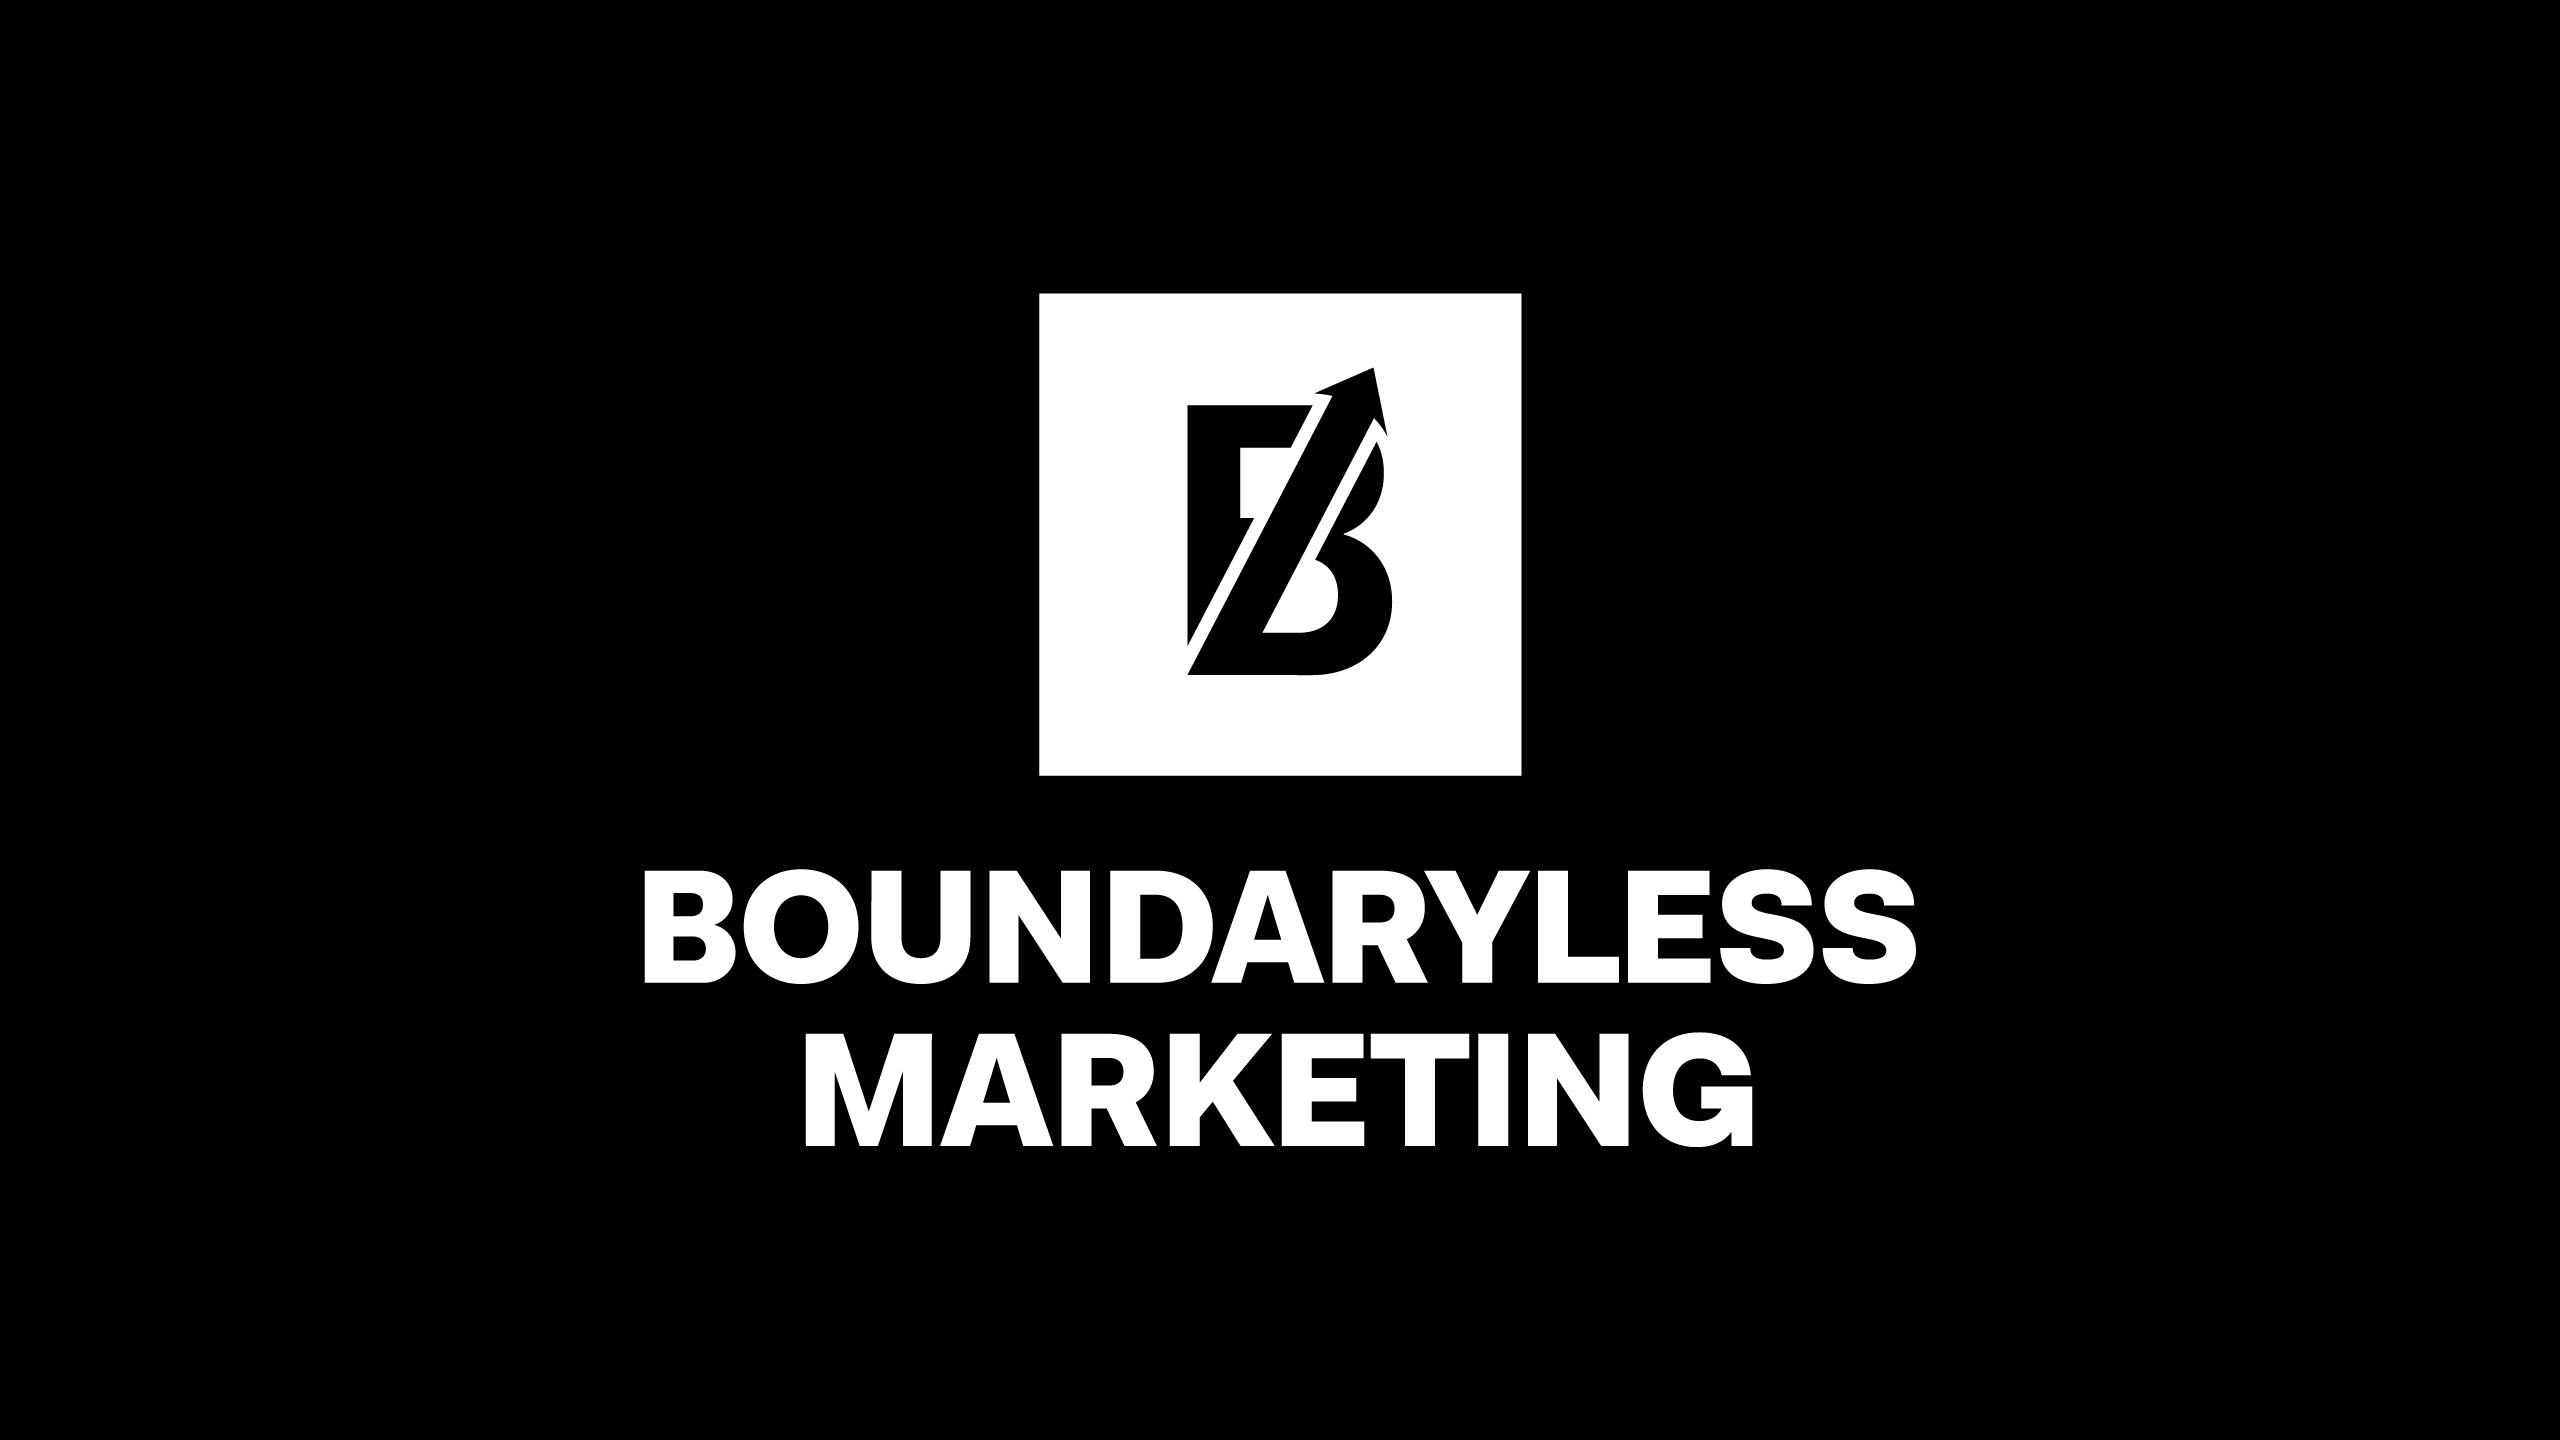 Boundaryless Marketing logo design